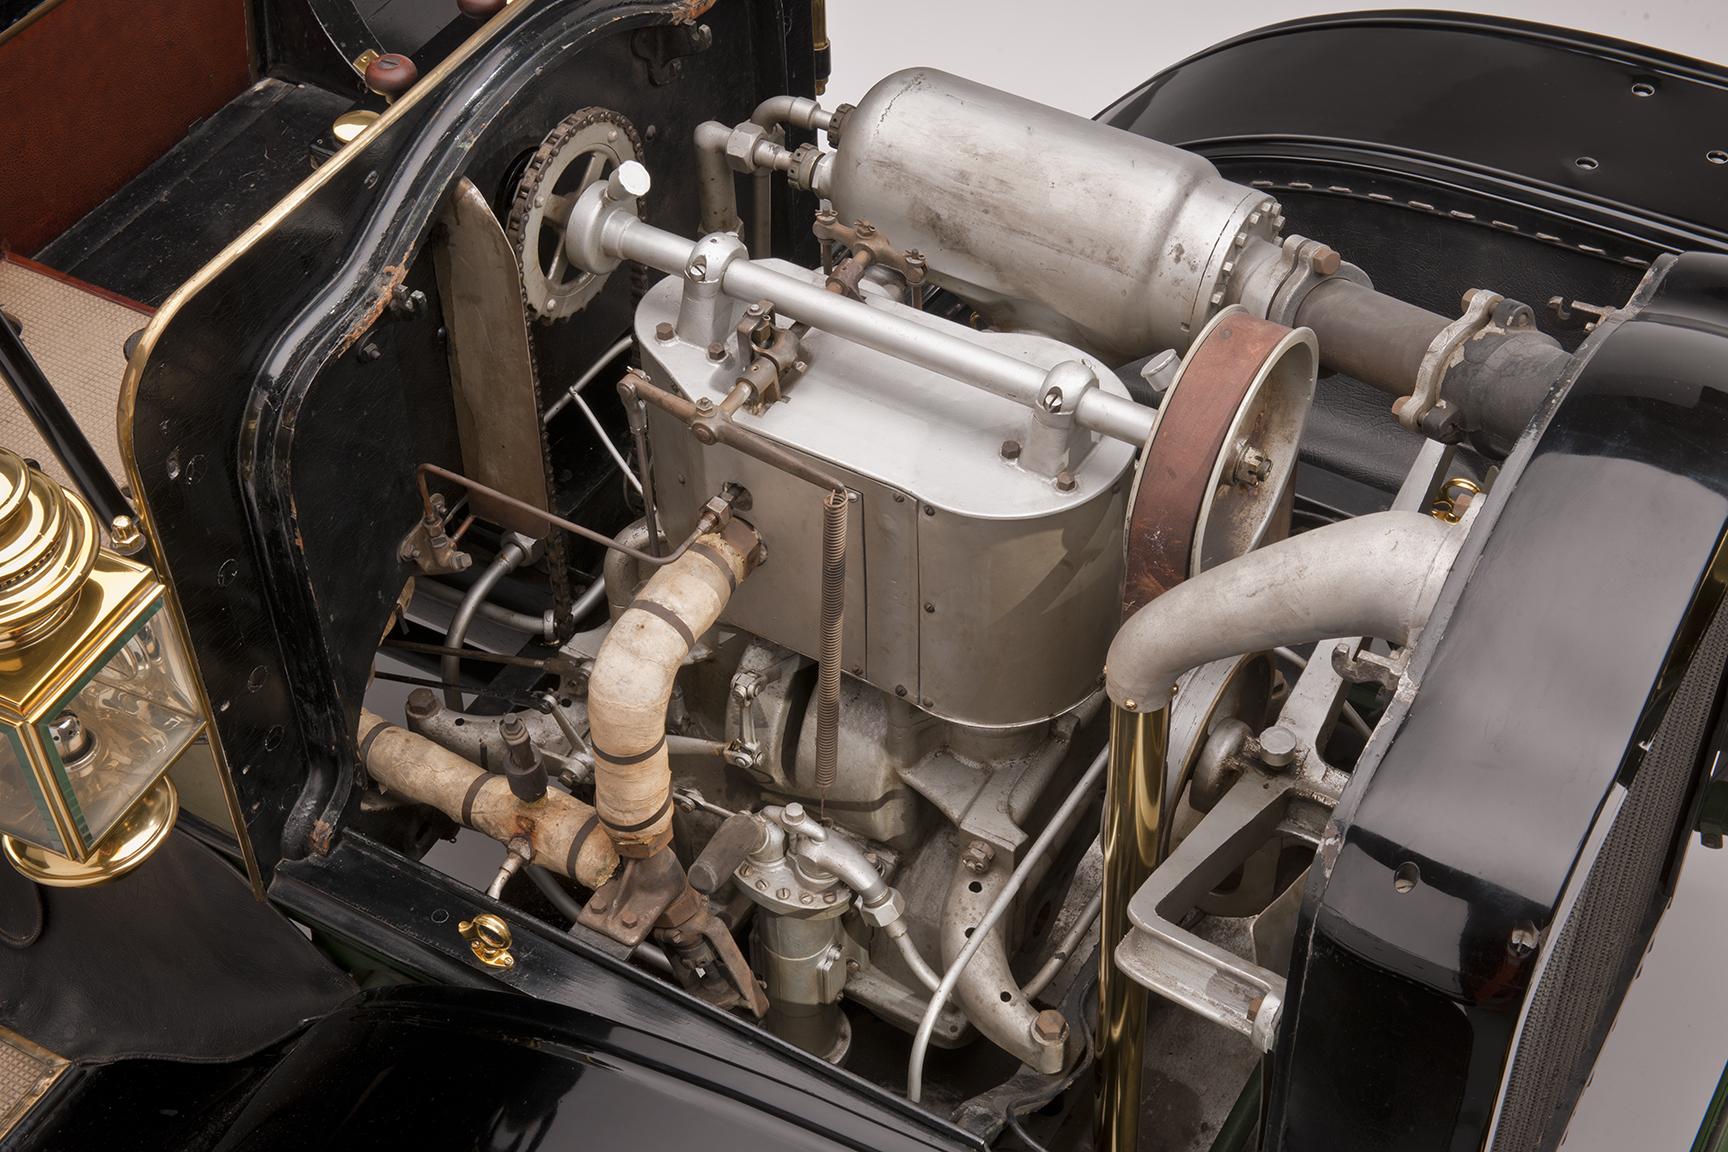 1907 White Model G Touring Car steam engine